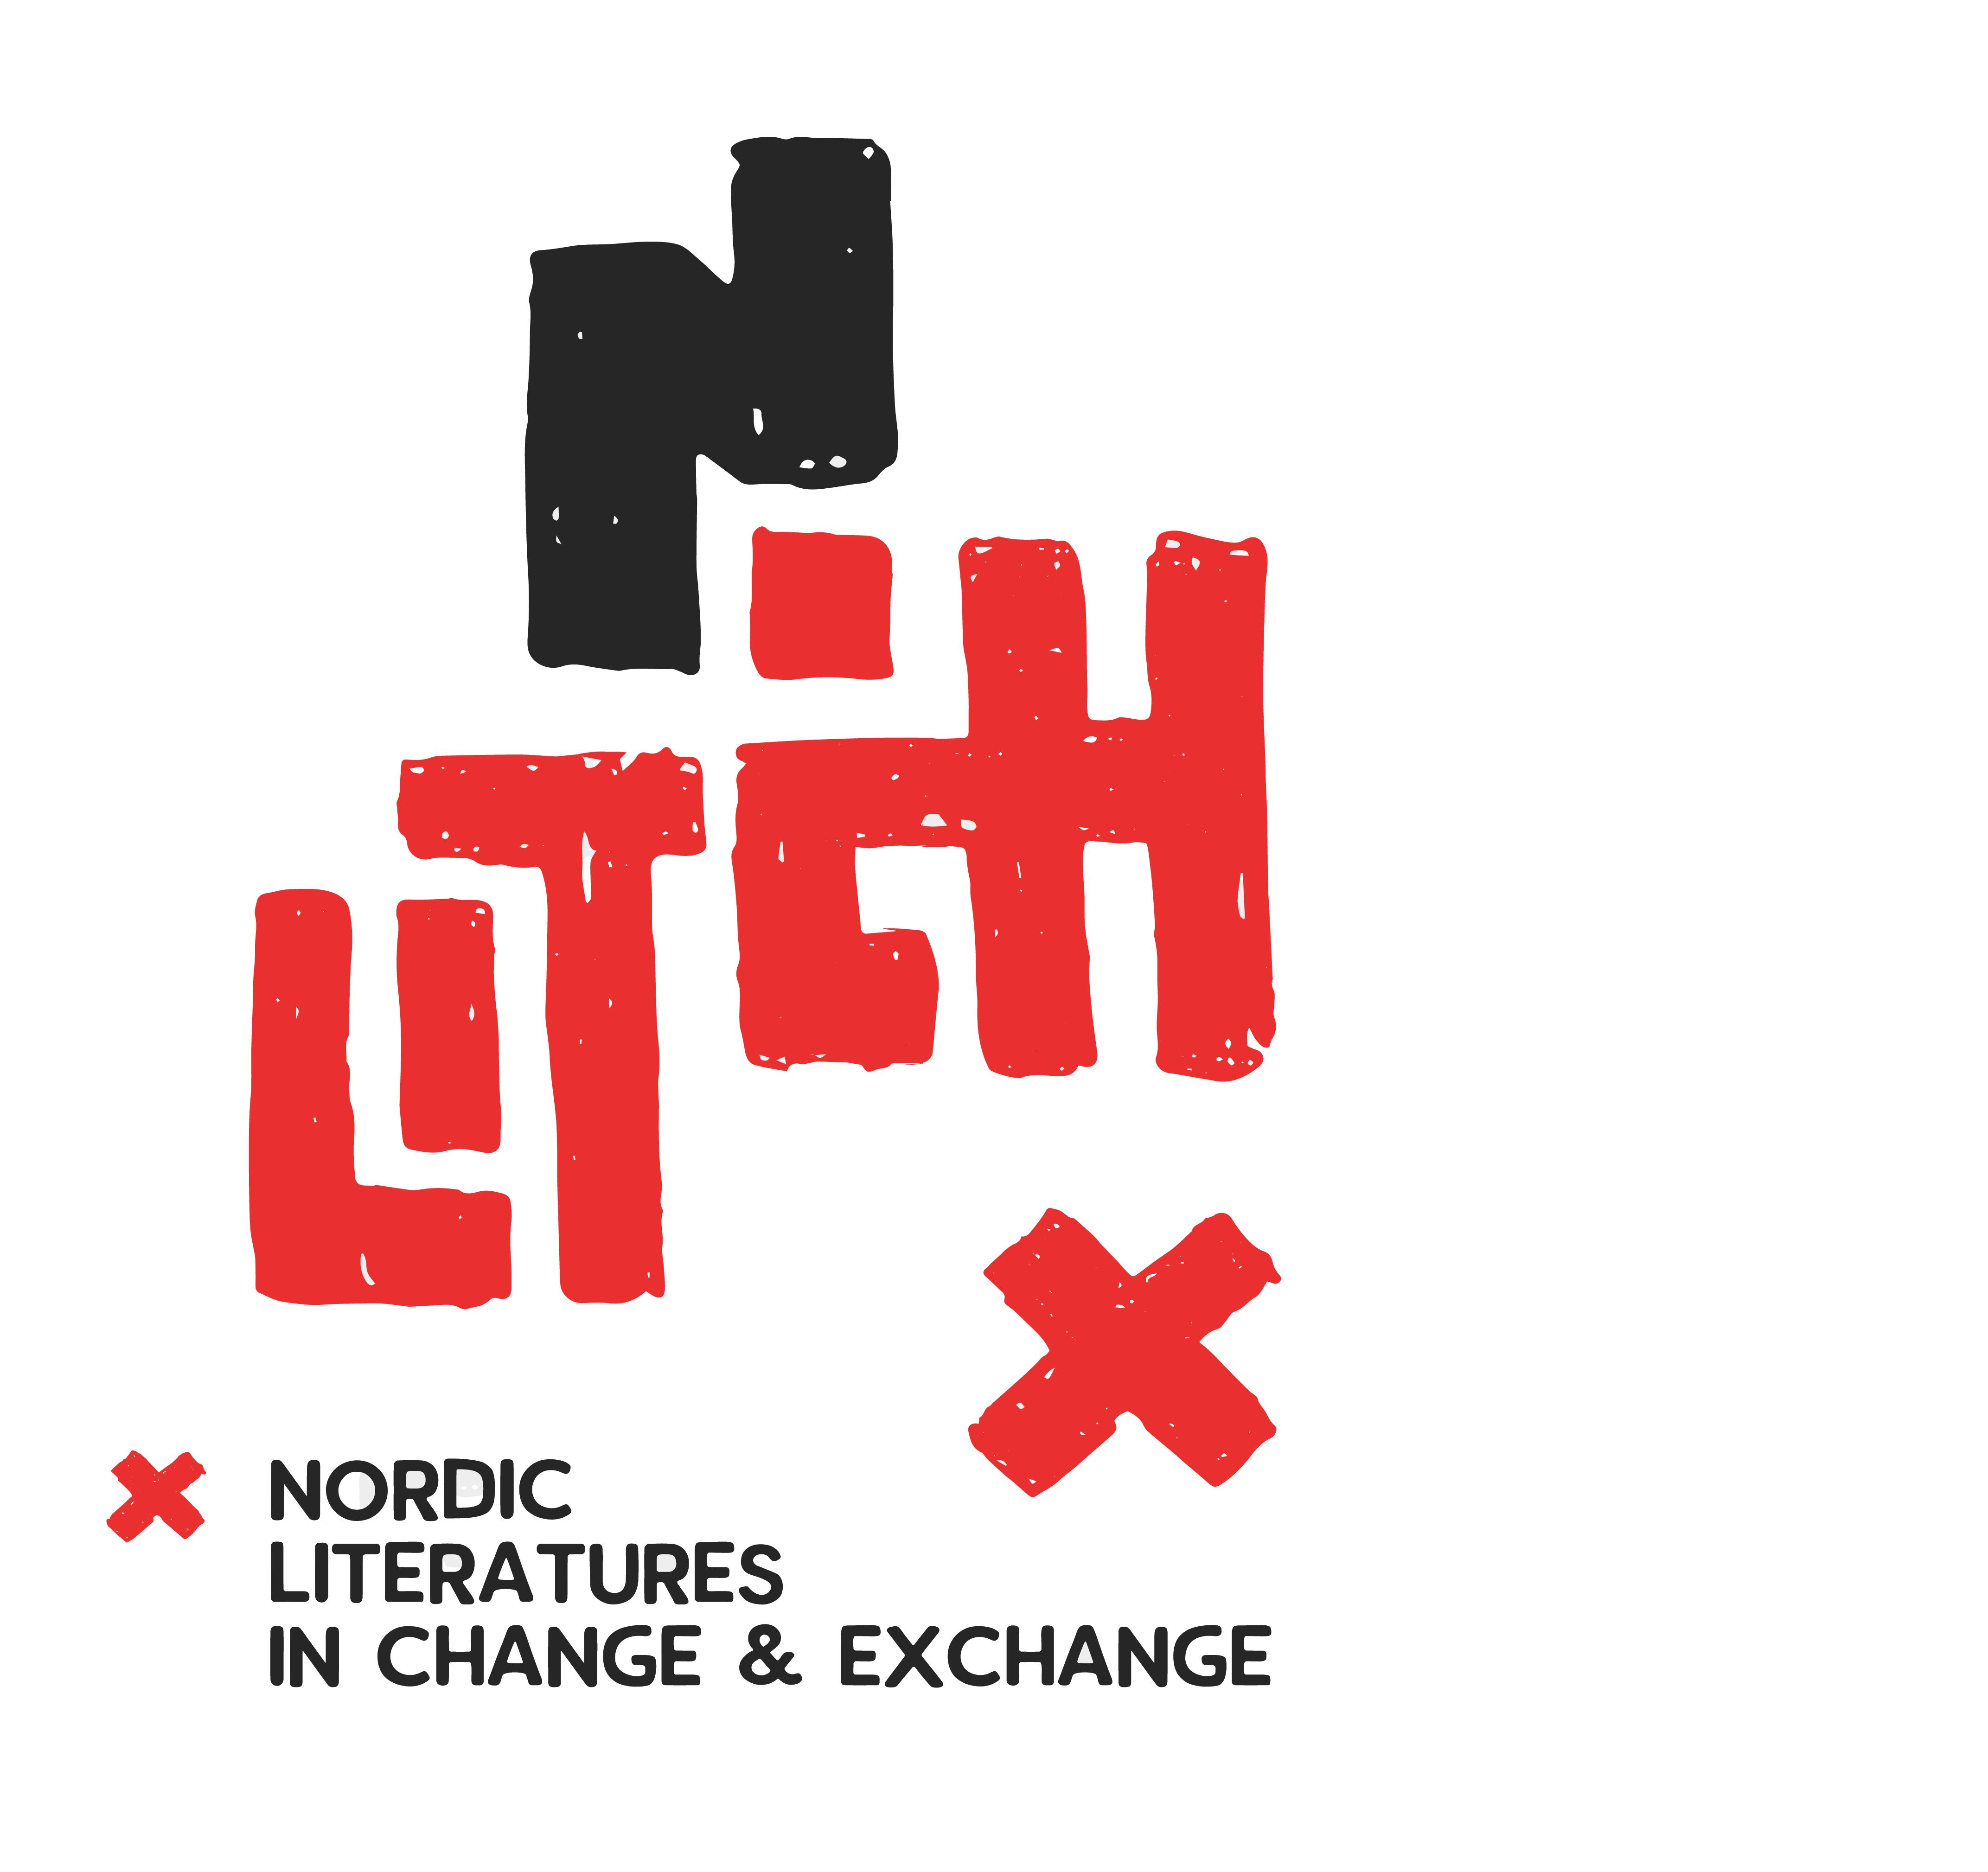 nolitchxtransparente2